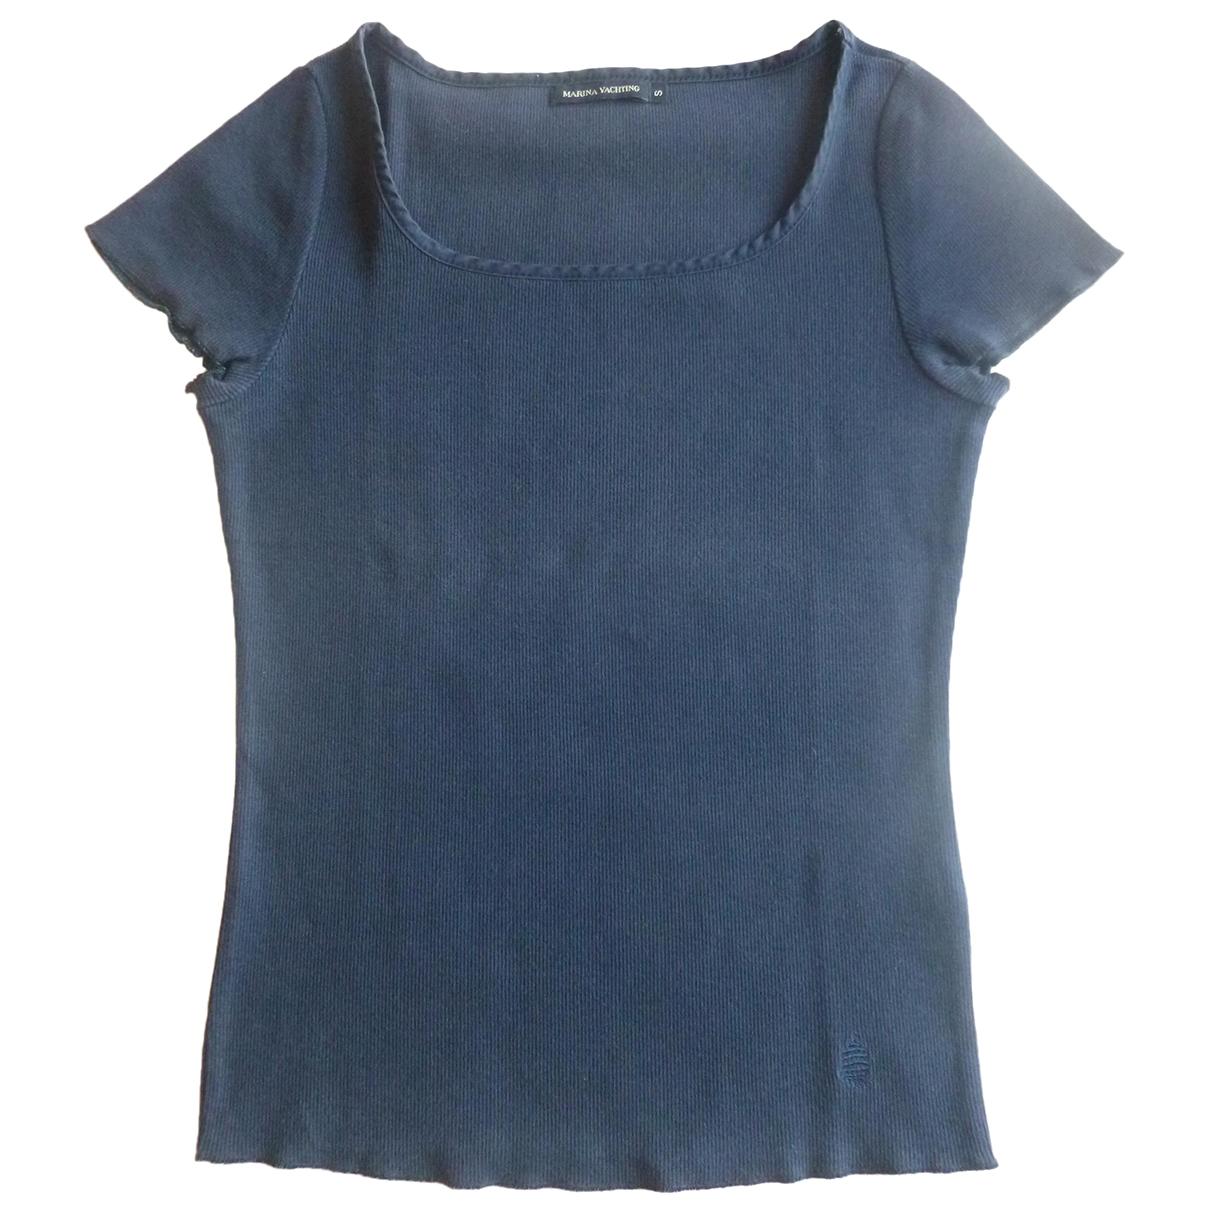 Marina Yachting - Top   pour femme en coton - bleu